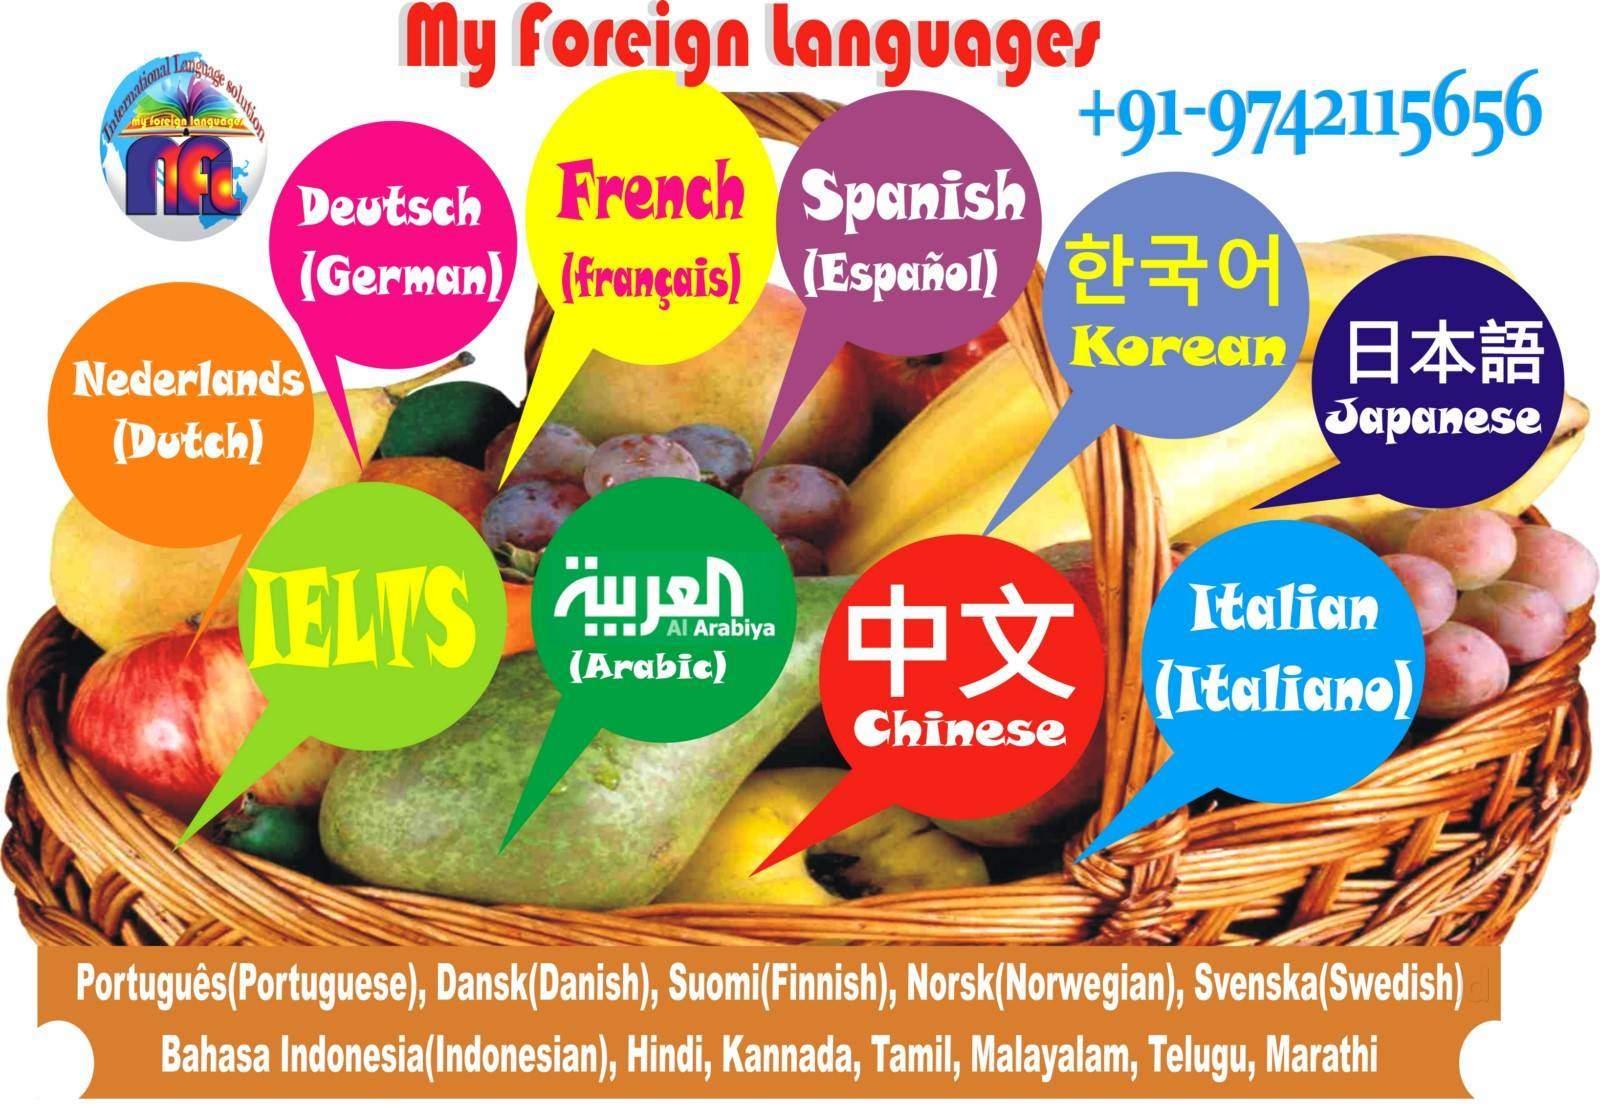 Top 30 Language Classes For Telugu in Bangalore - Justdial